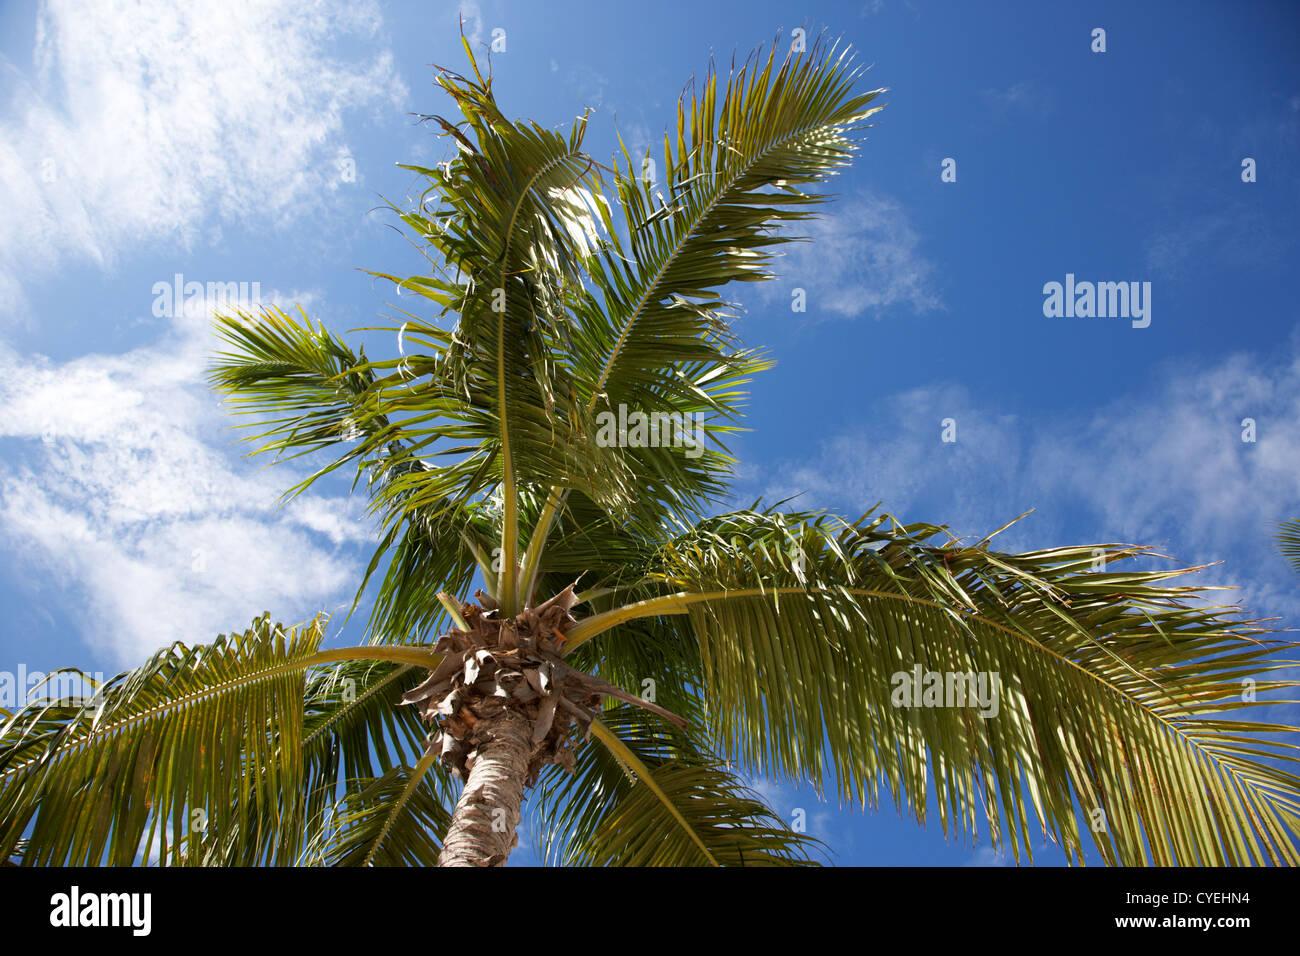 palm tree against blue sky islamorada florida keys usa - Stock Image